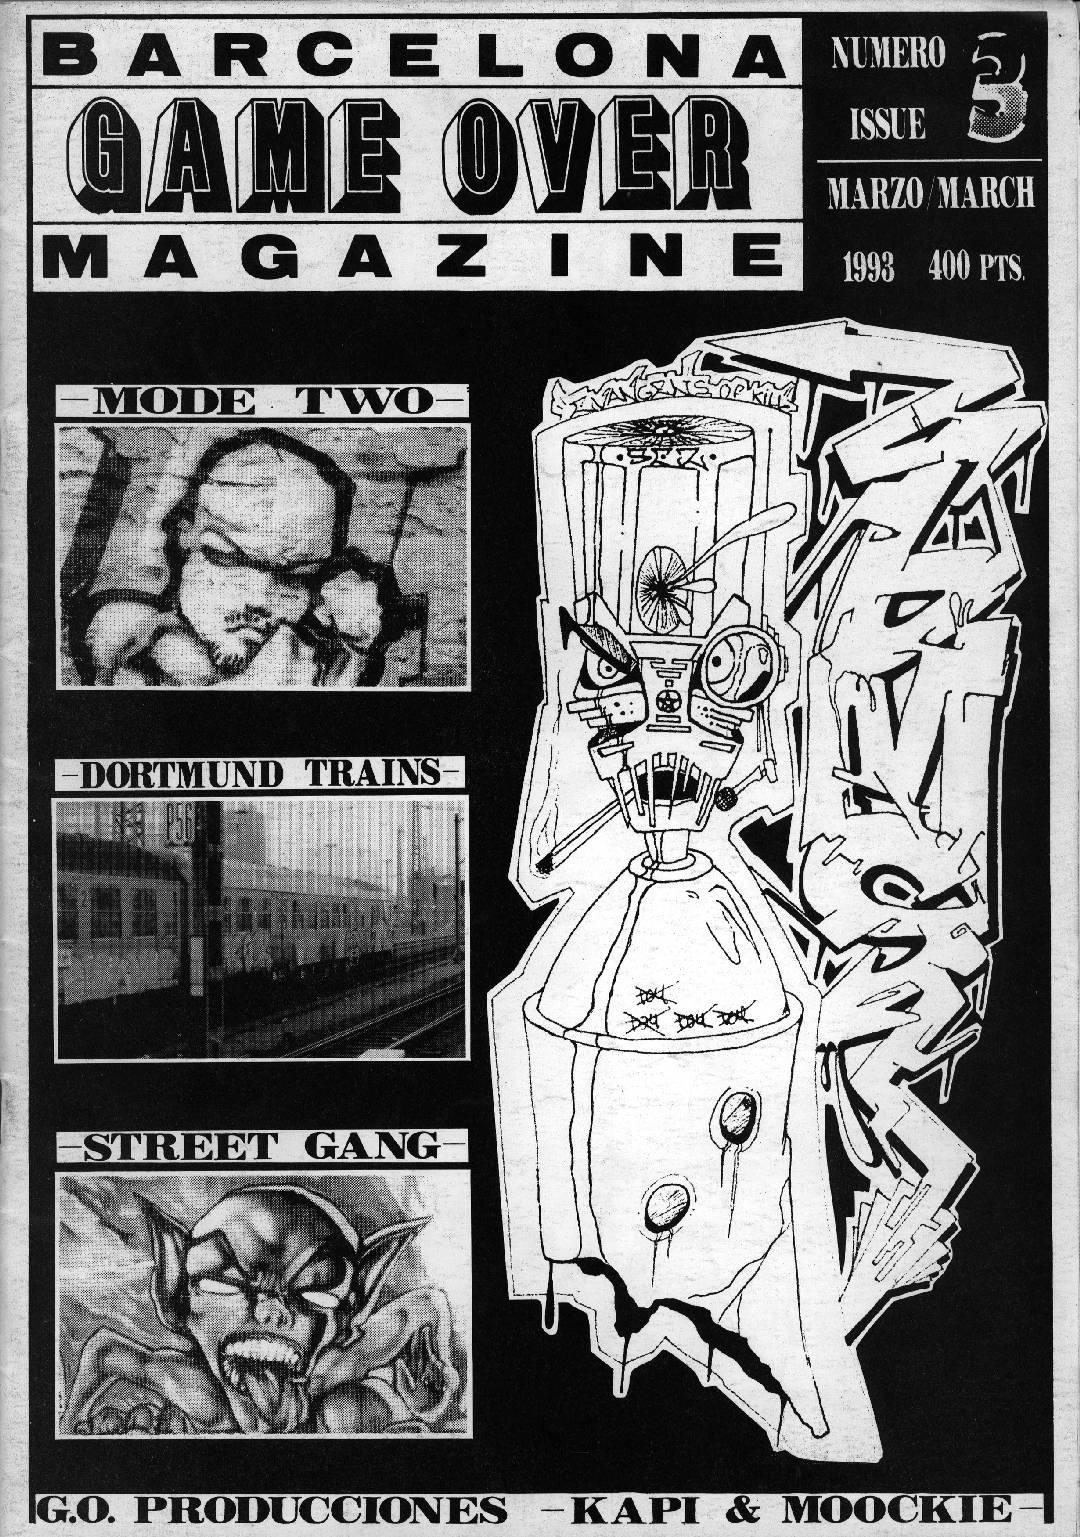 Game Over Magazine